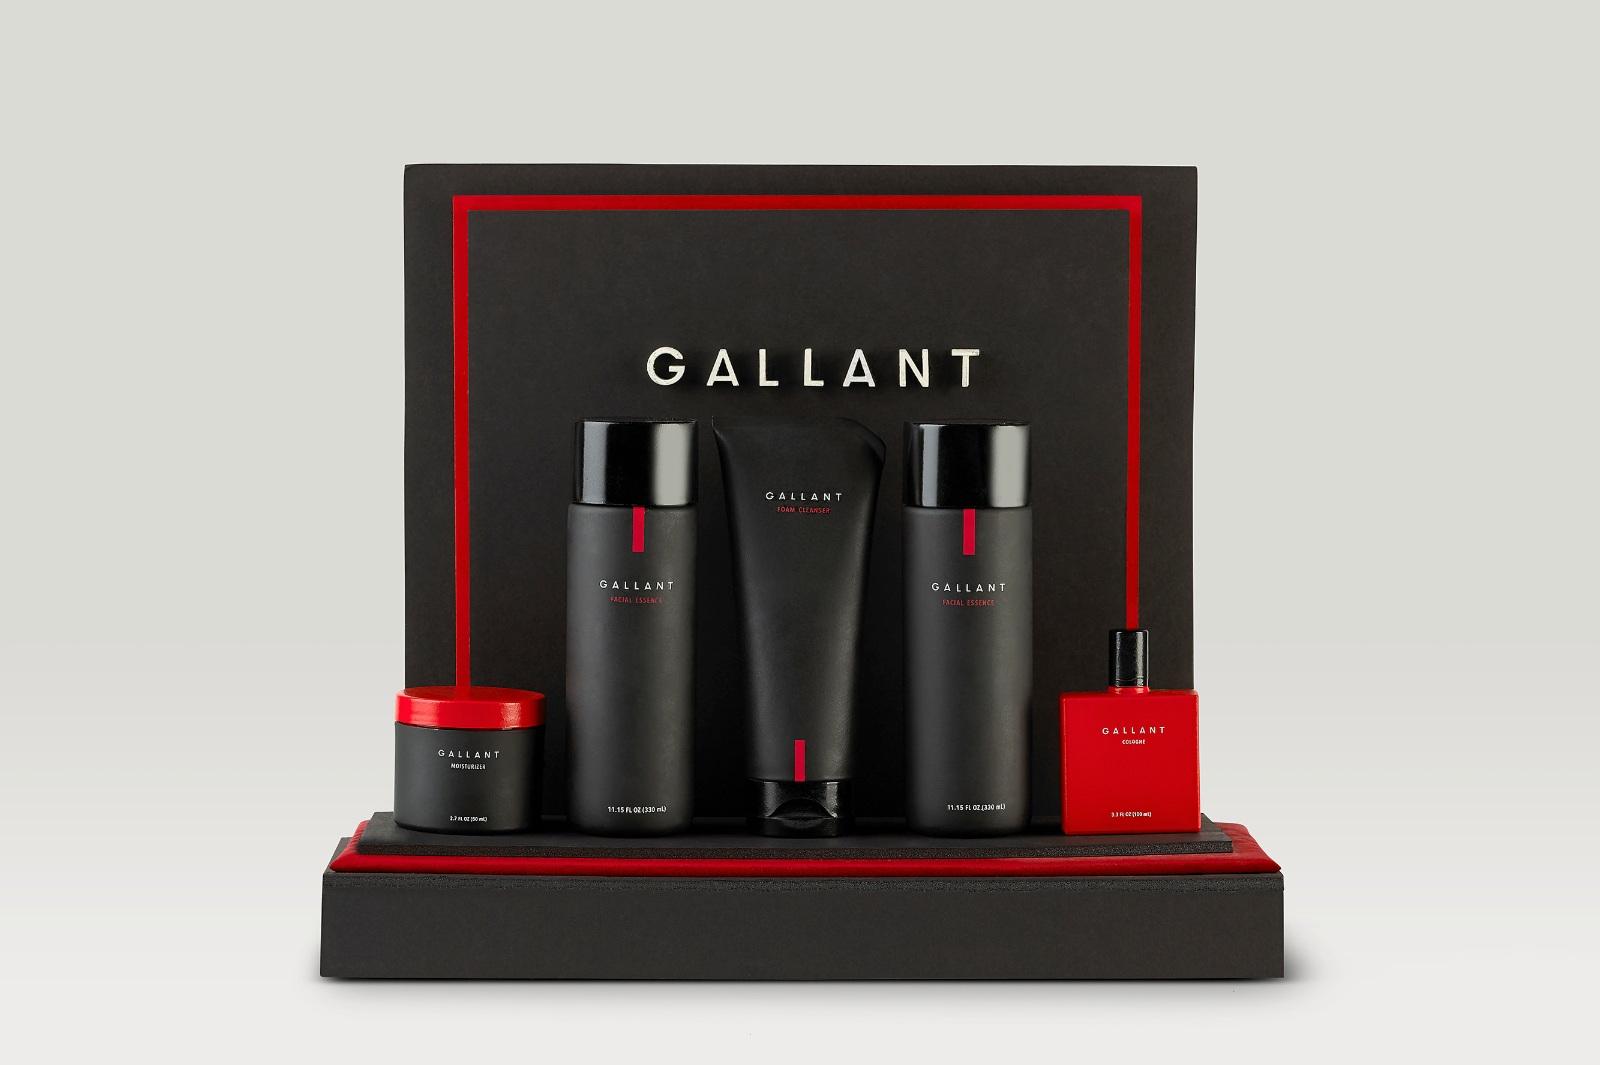 Gallant_1.jpg